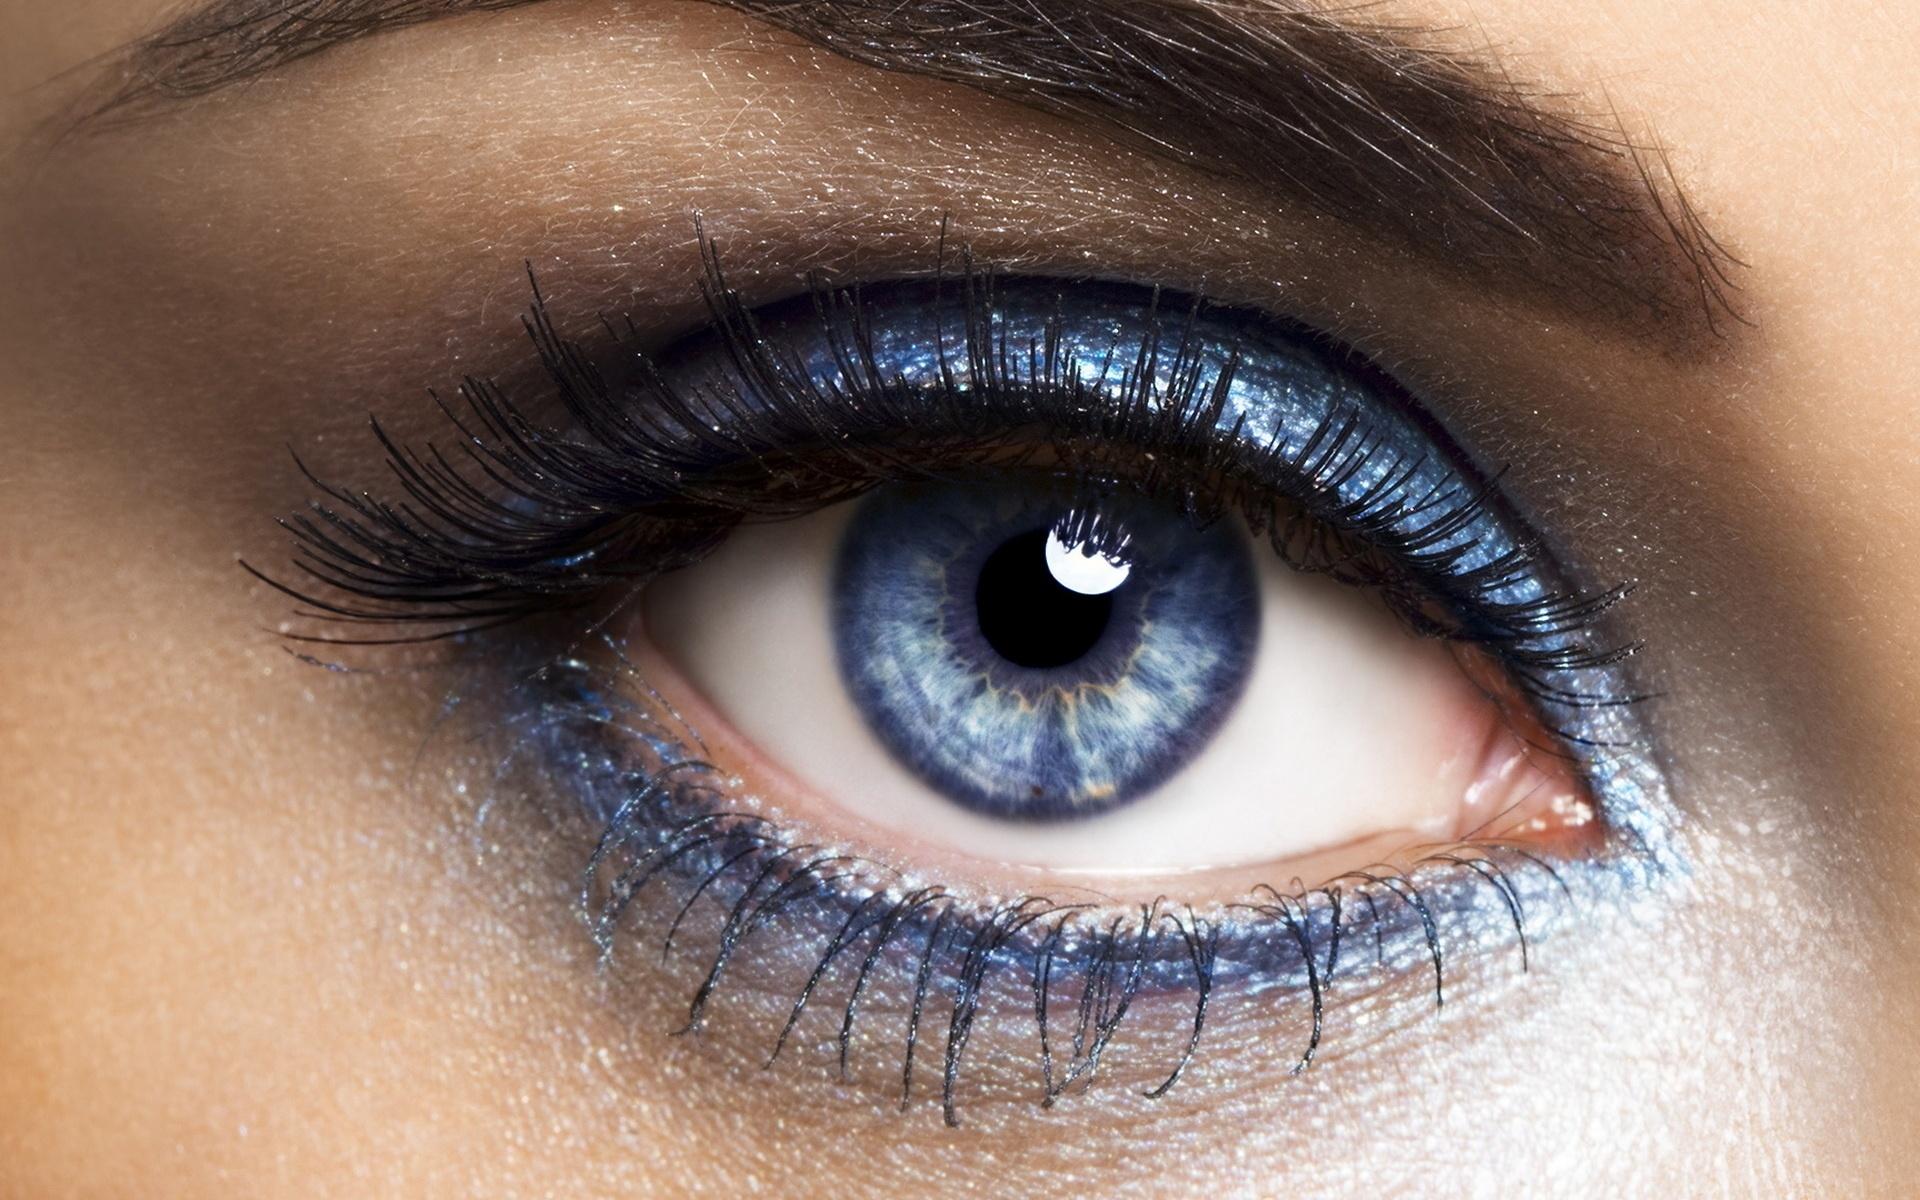 Eye Makeup 22431 1920x1200 px HDWallSourcecom